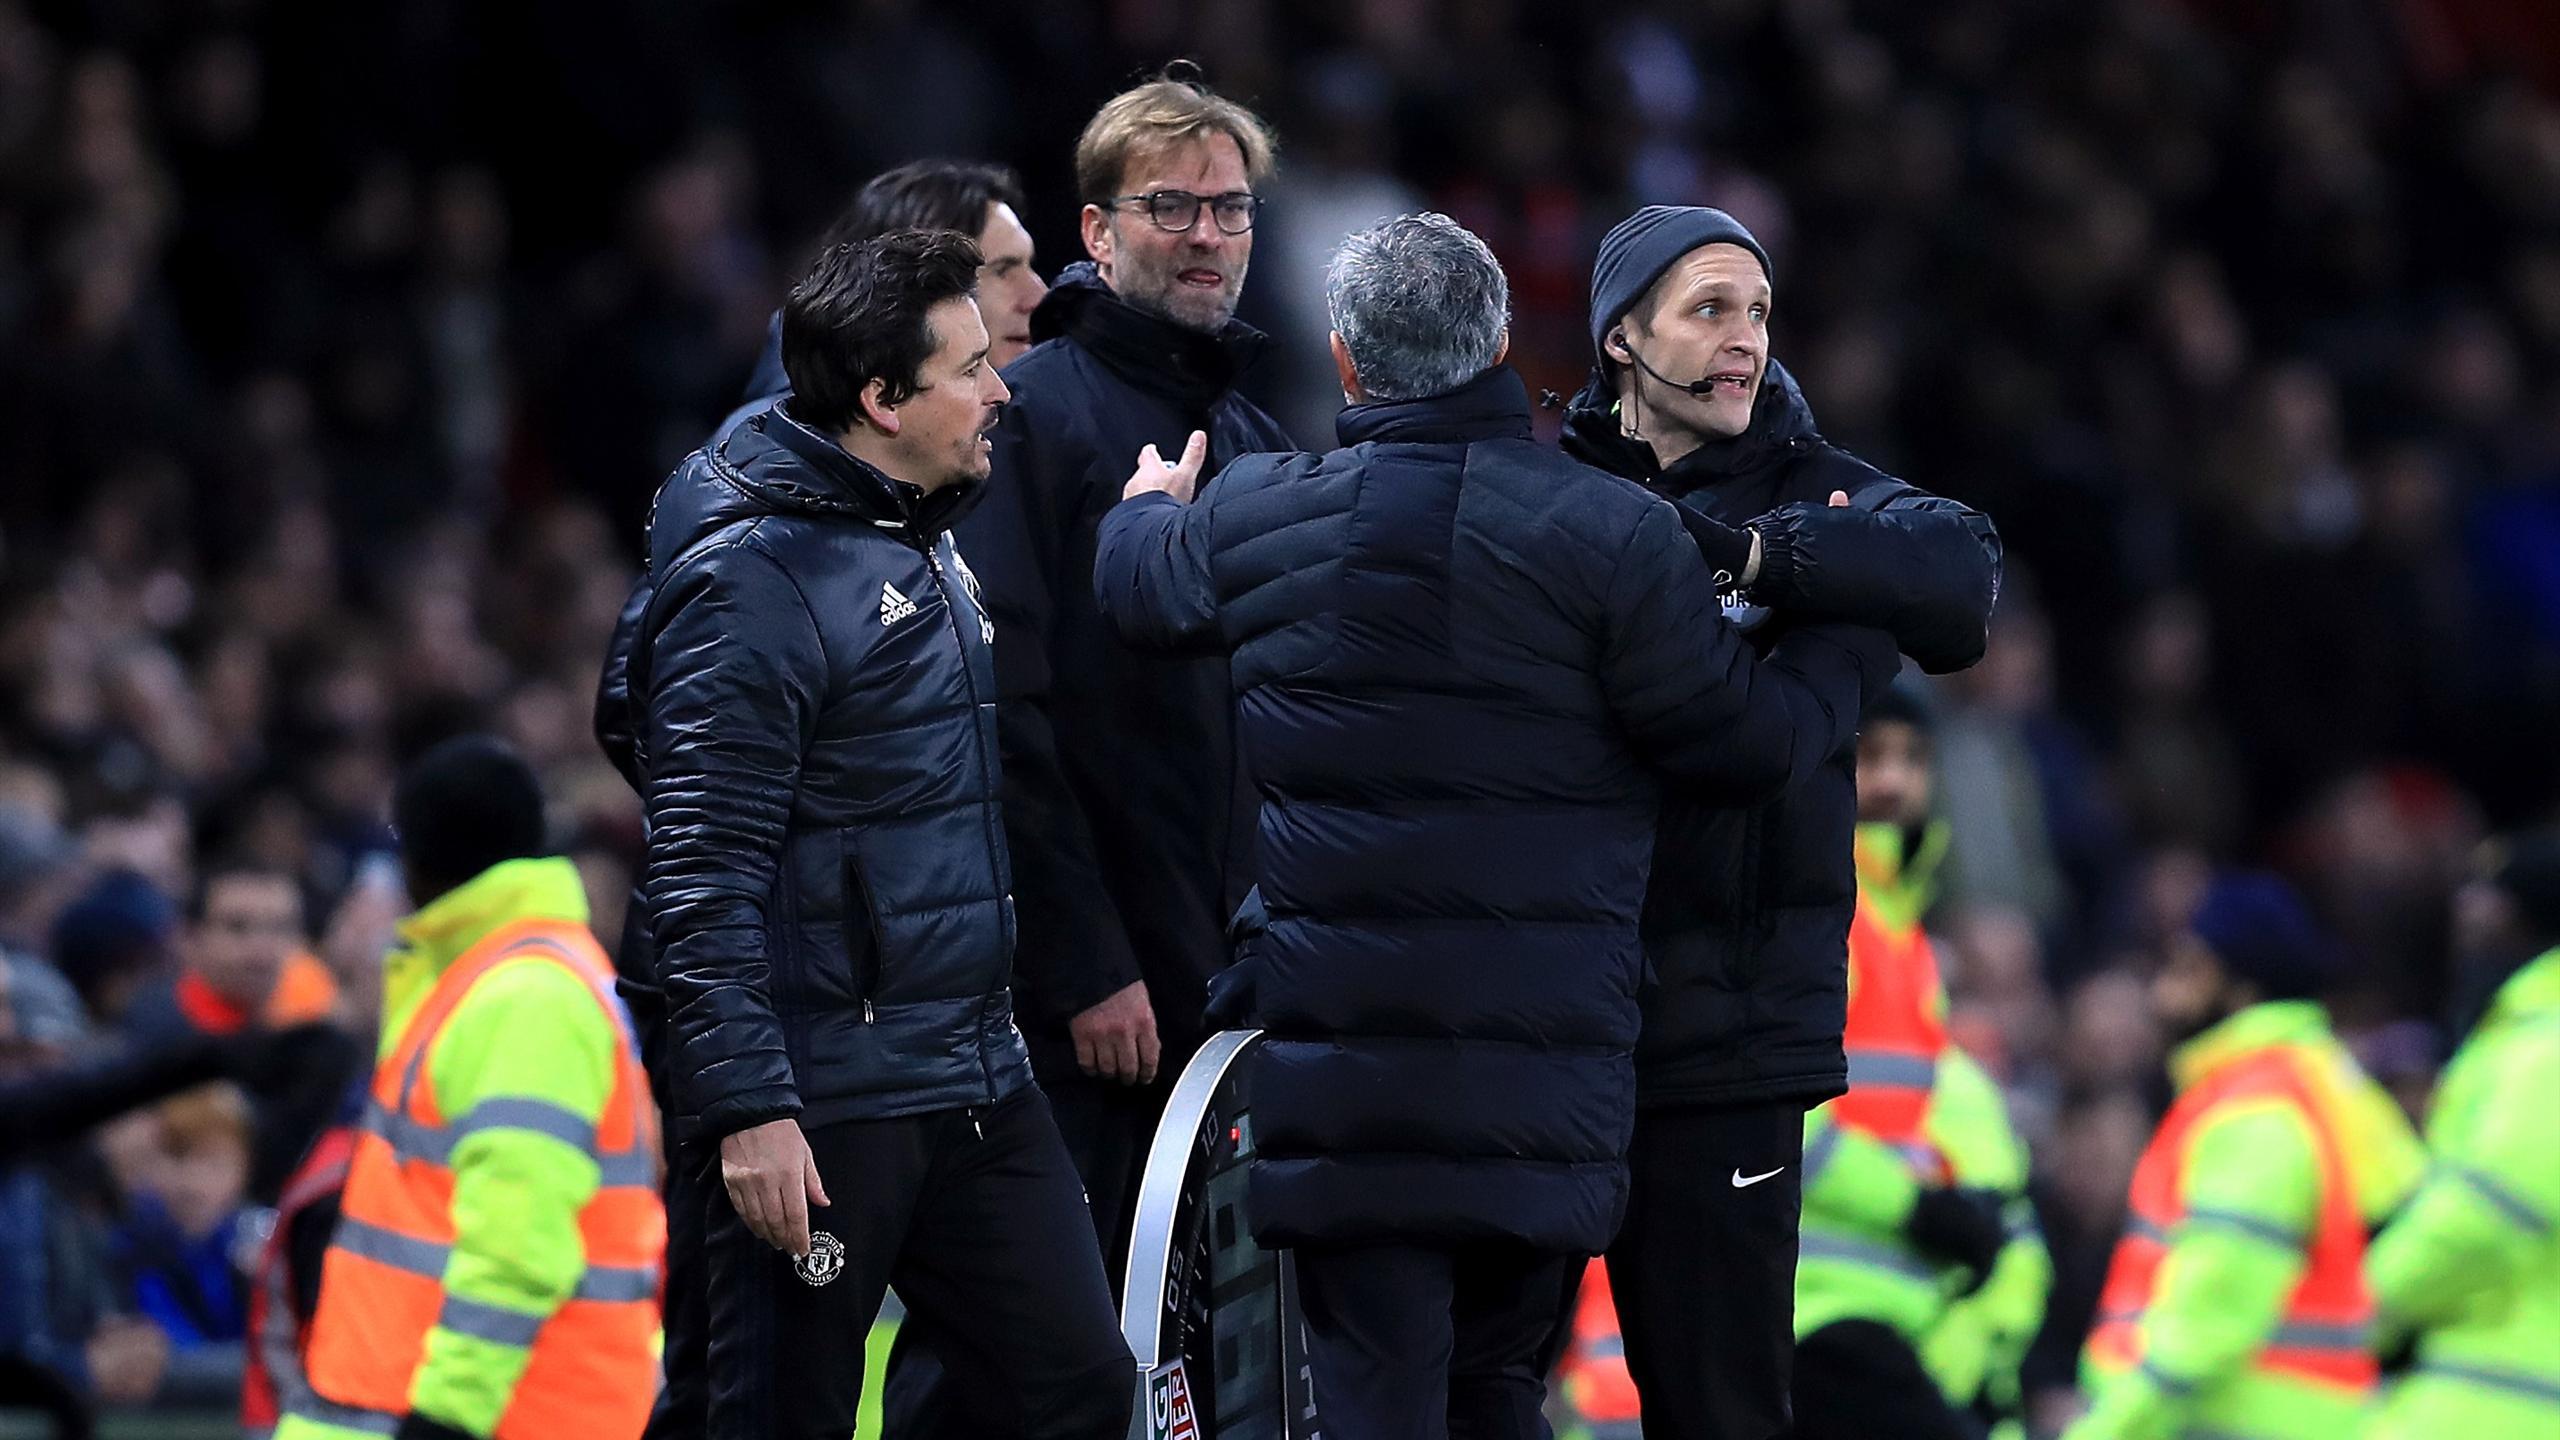 Manchester United manager Jose Mourinho (front) and Liverpool manager Jurgen Klopp (back) exchange words